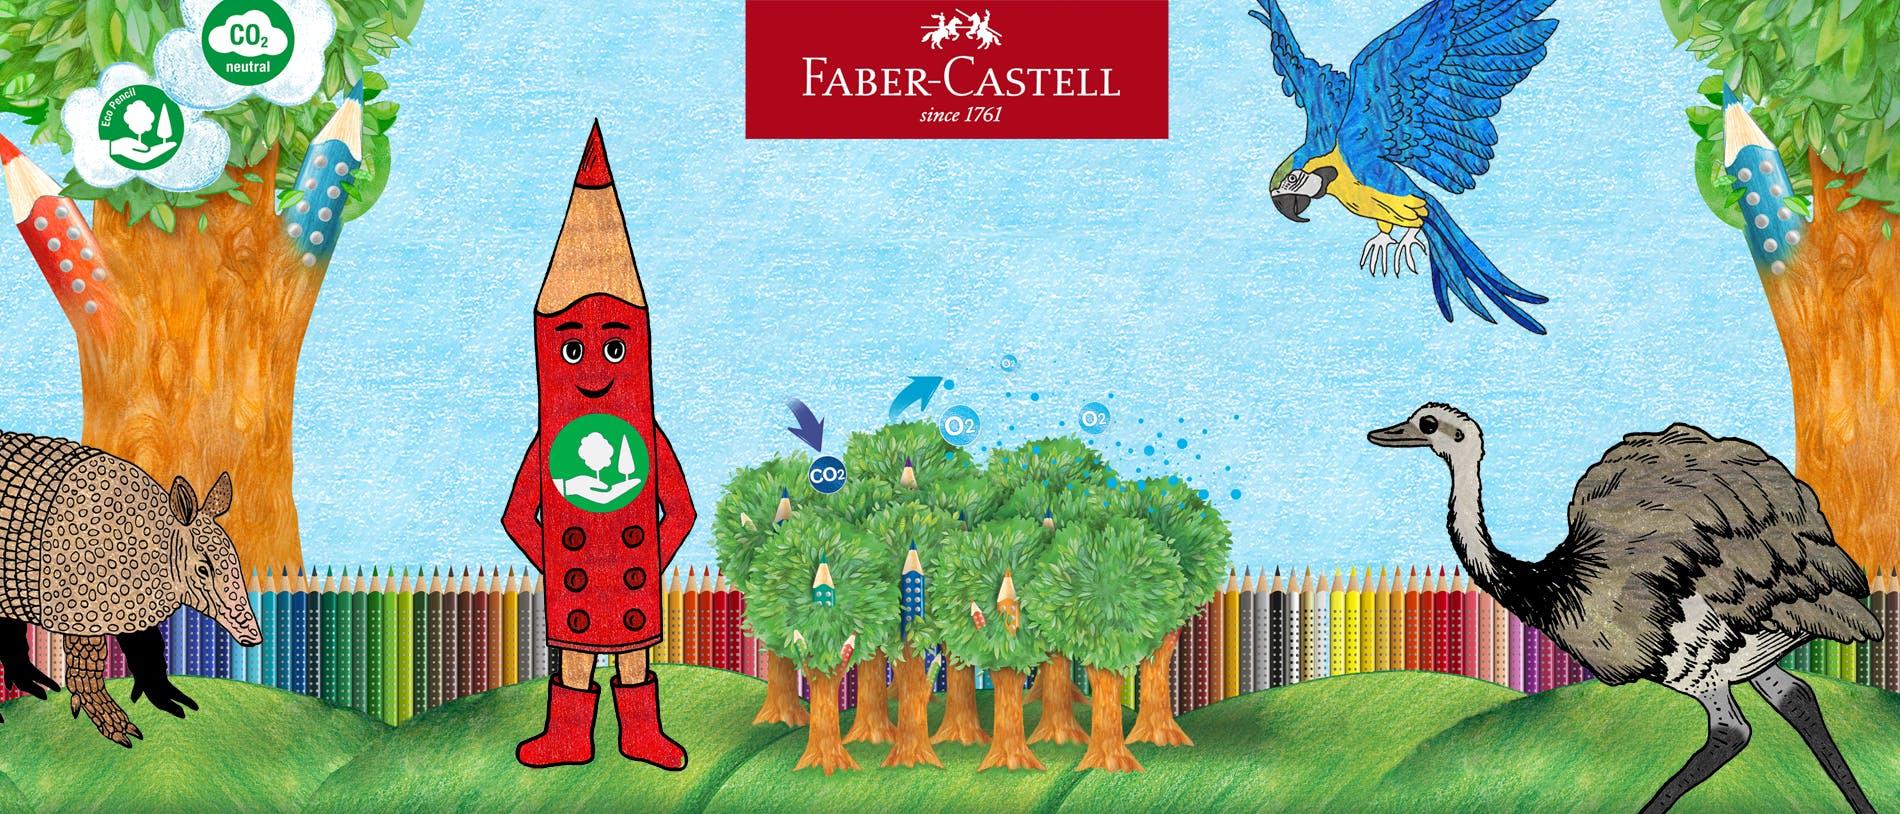 Blog Wakatoon | Coloriage animé Faber-Castell sur-mesure